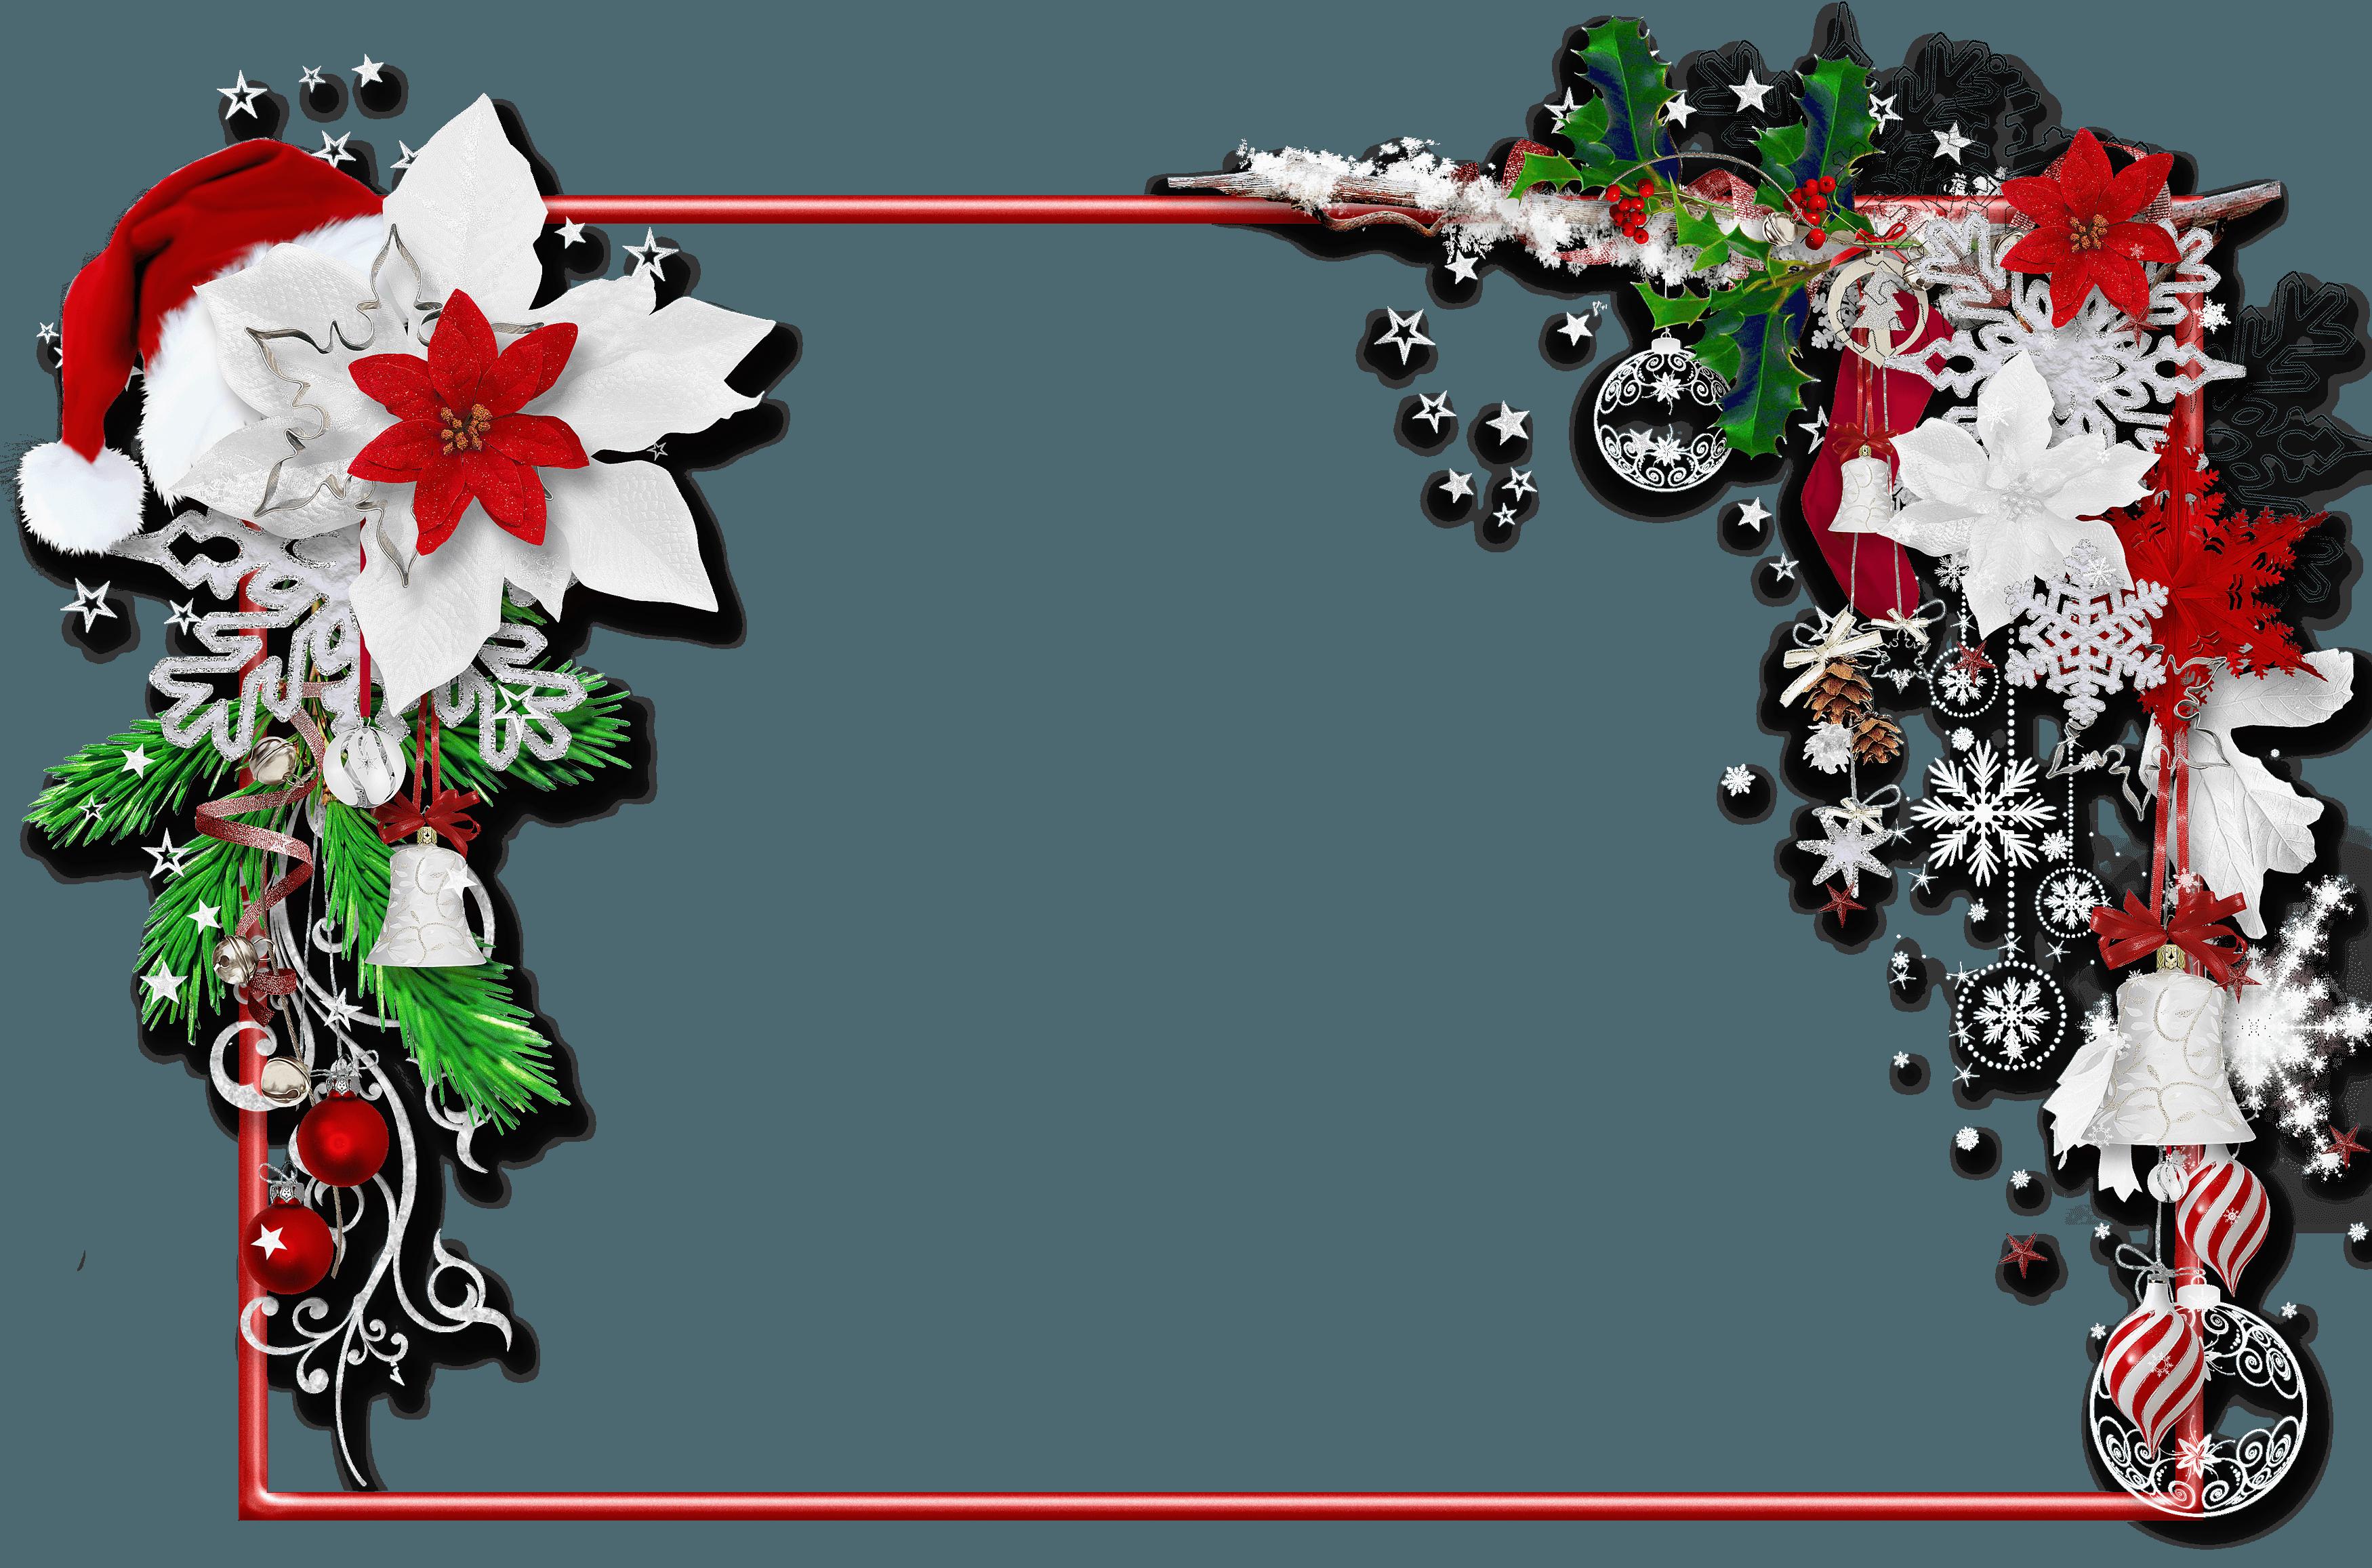 Christmas Mistletoe Wallpapers - Wallpaper Cave